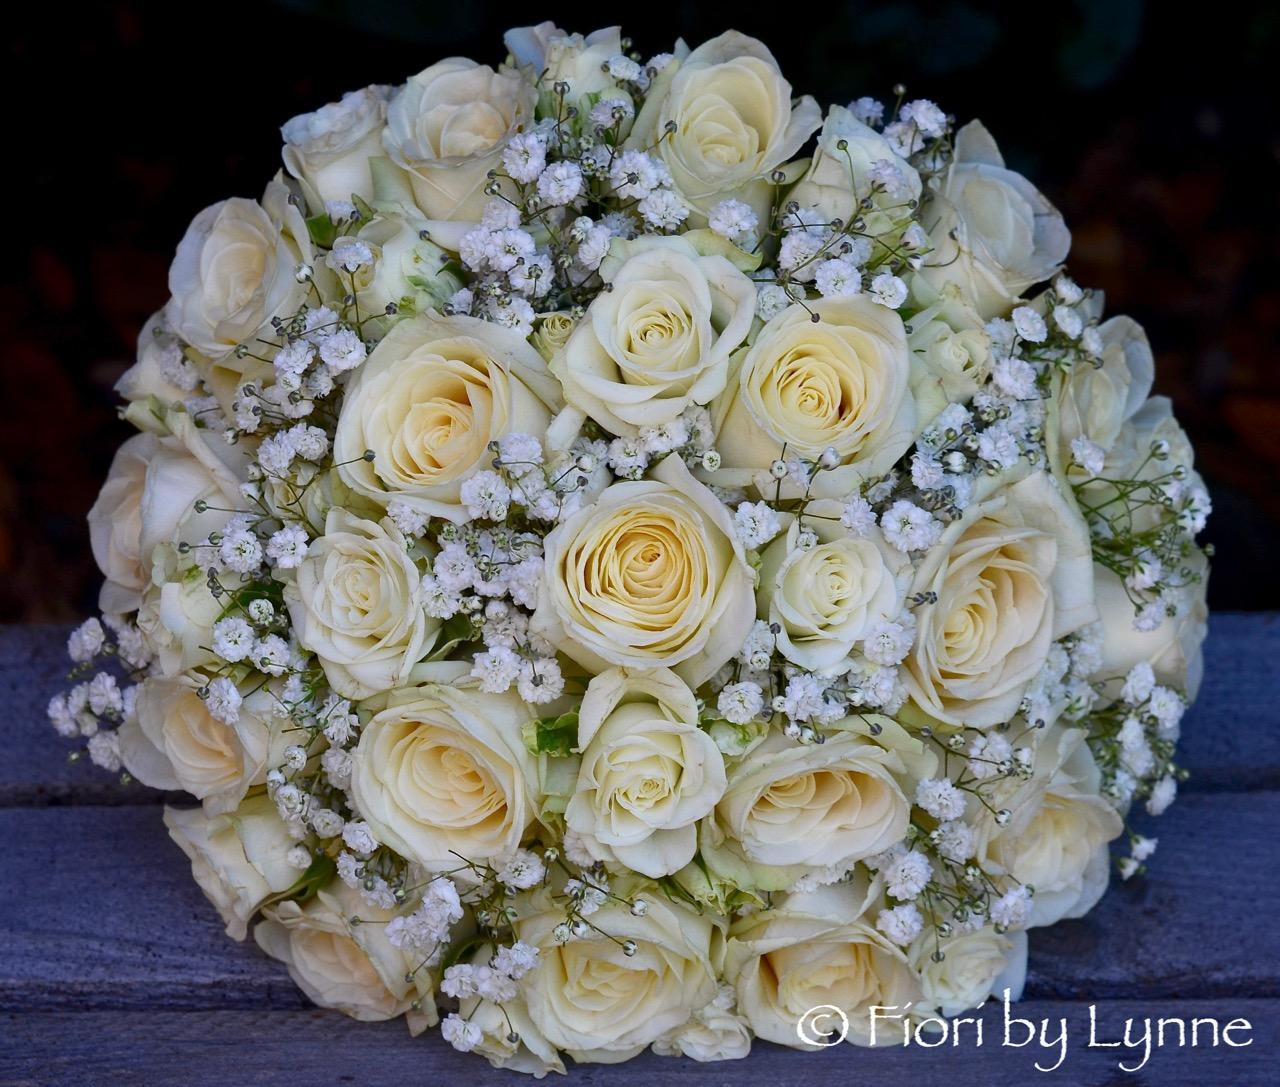 Wedding flowers blog september 2017 fred and rebeccas classic white wedding flowers lainston house mightylinksfo